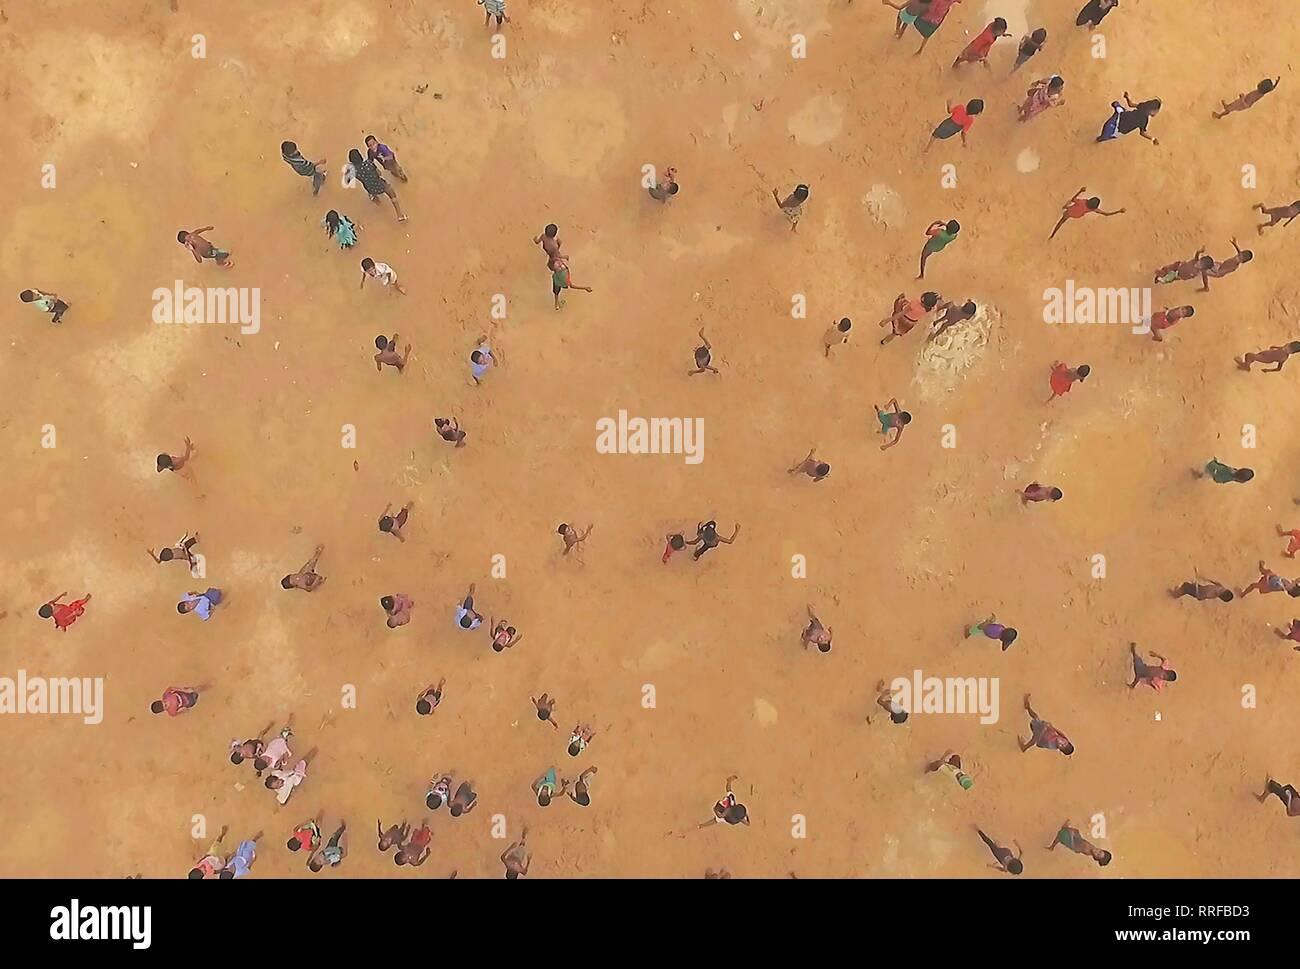 HUMAN FLOW, REFUGEES, 2017 - Stock Image